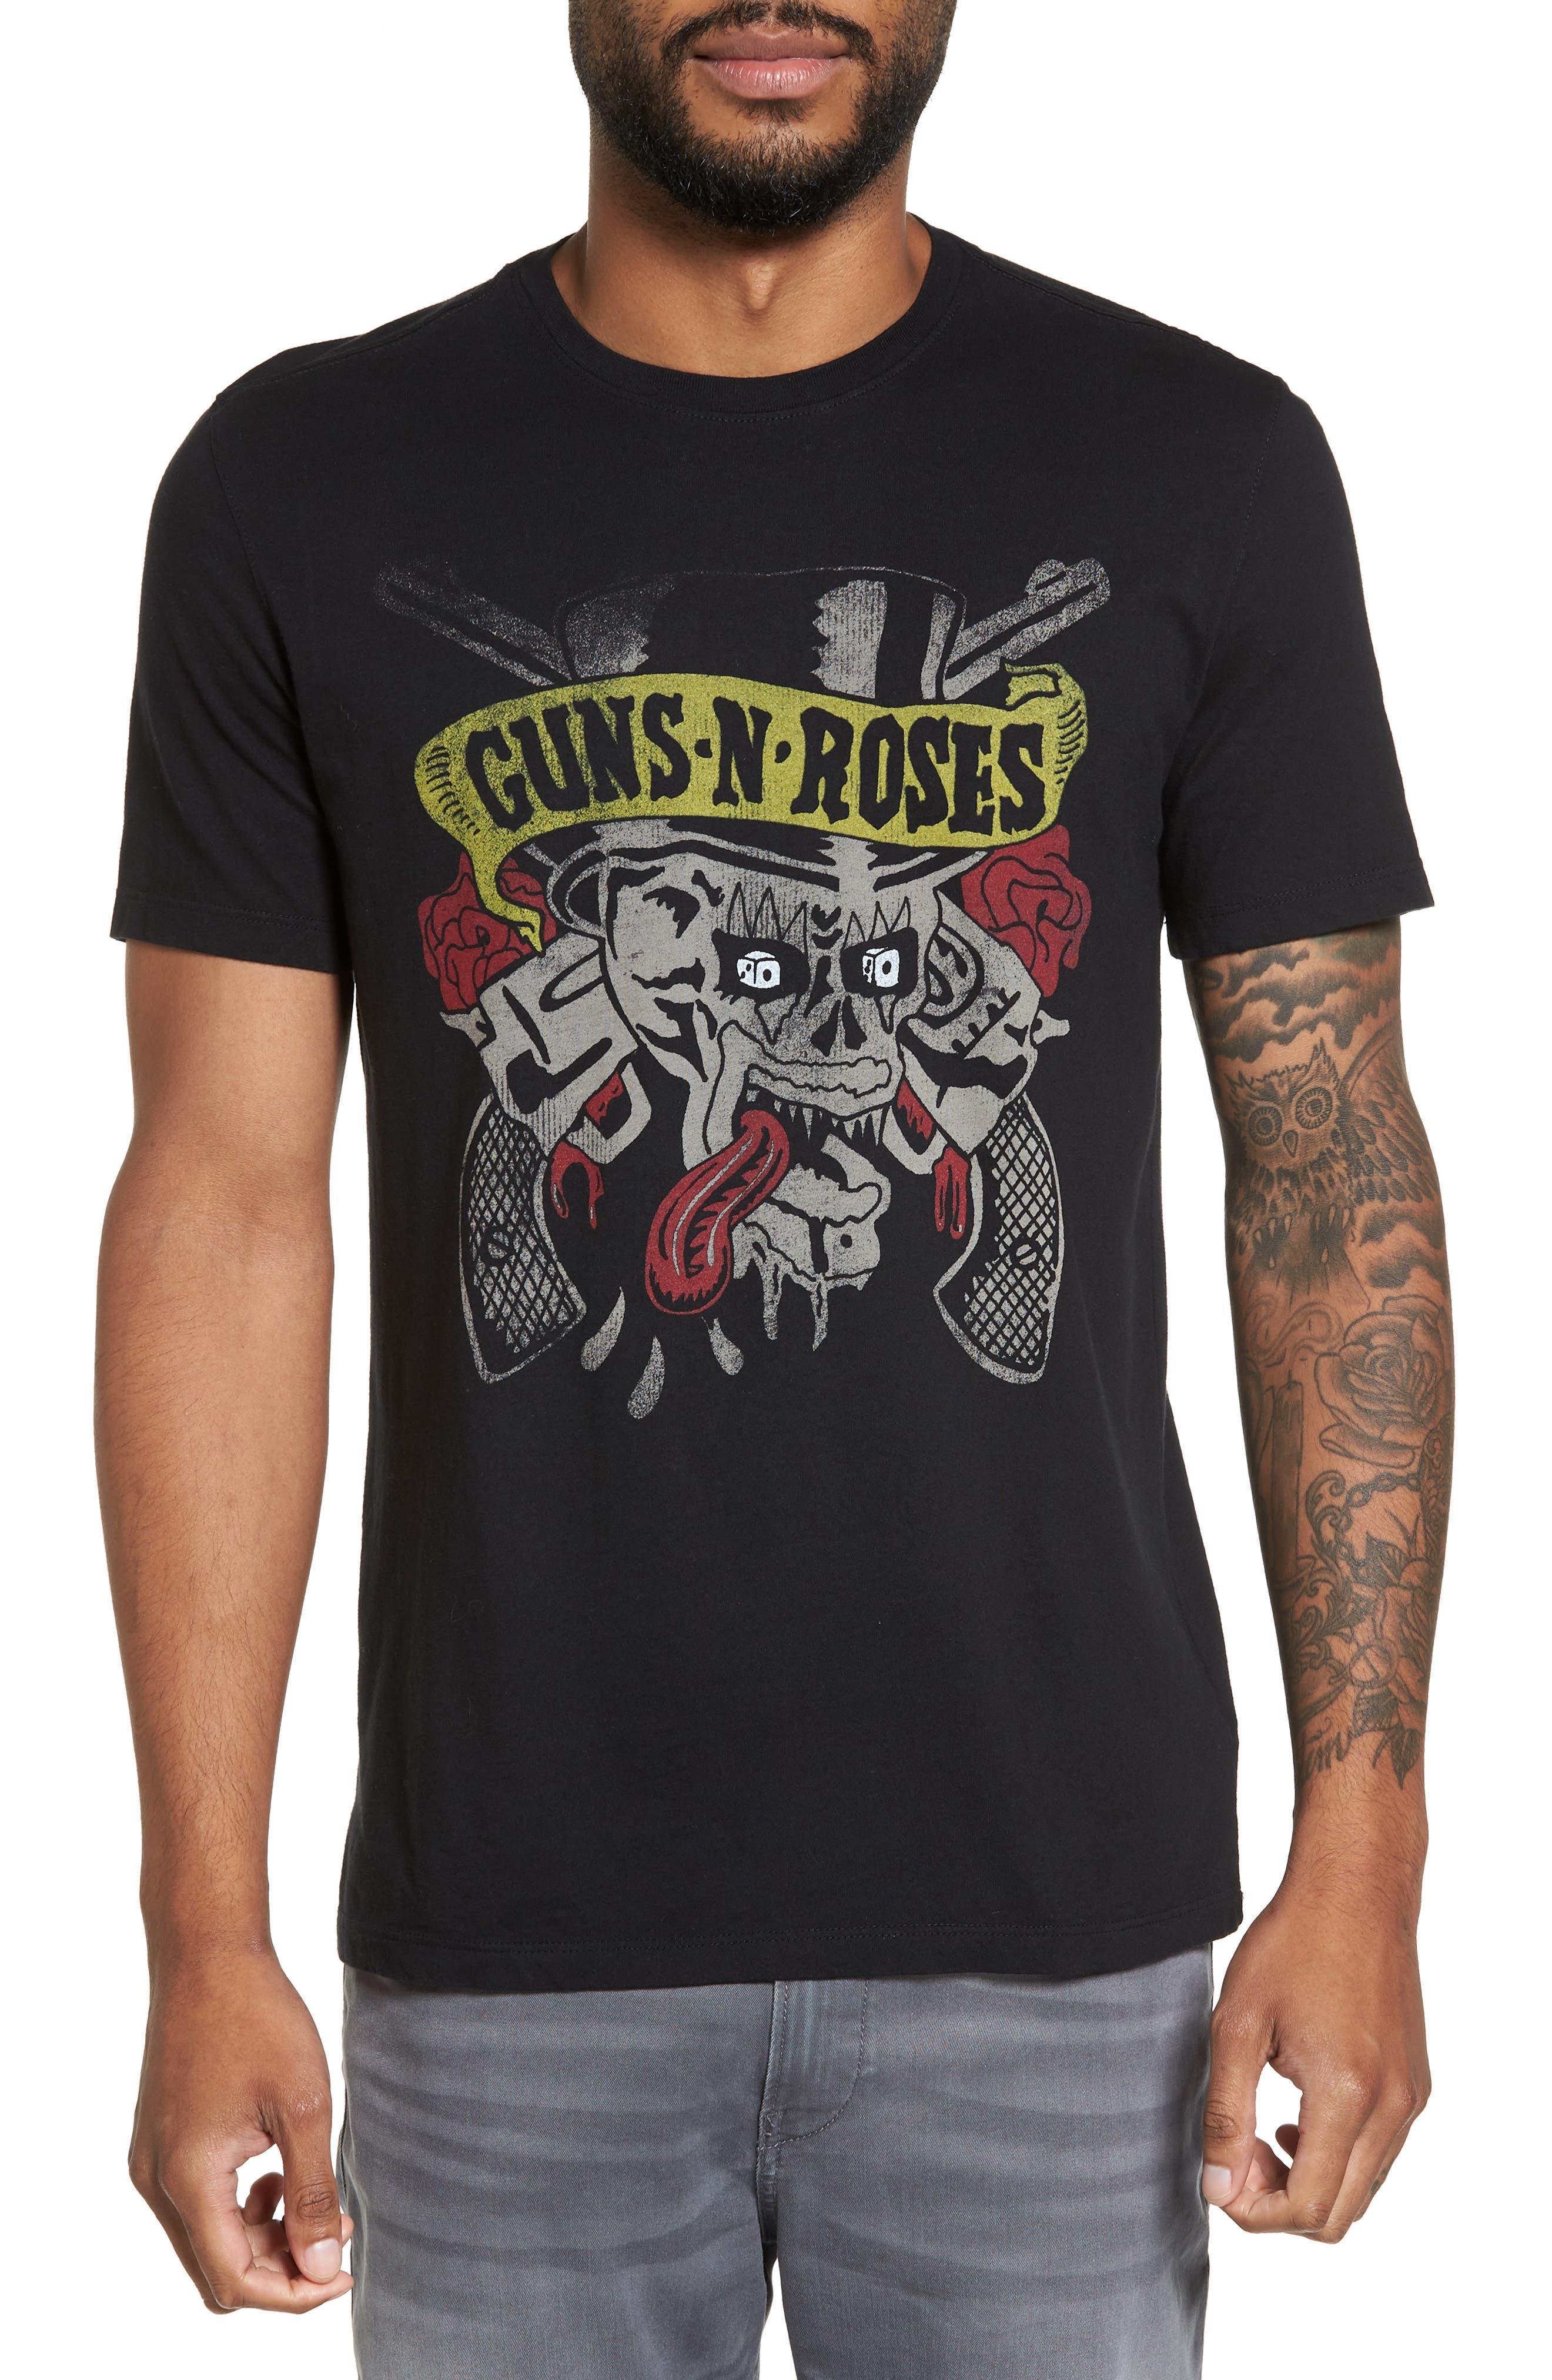 John Varvatos Guns N' Roses Graphic T-Shirt